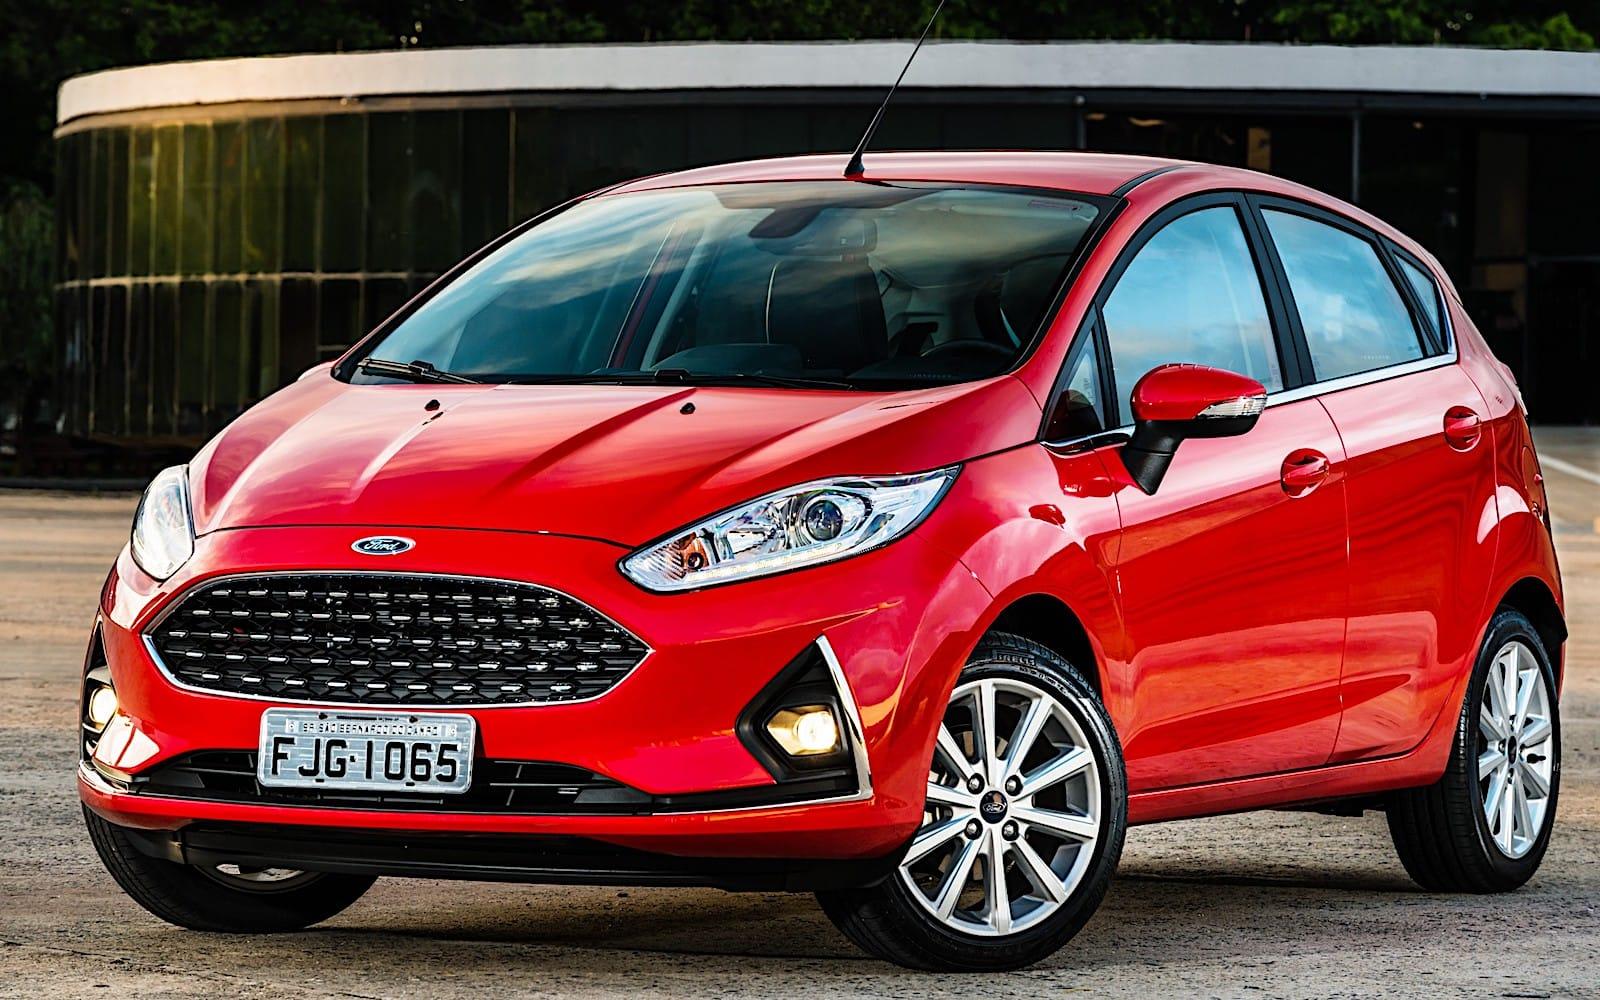 Ford-Fiesta-2018-1.jpg.pagespeed.ce.PXYjEfzsjp